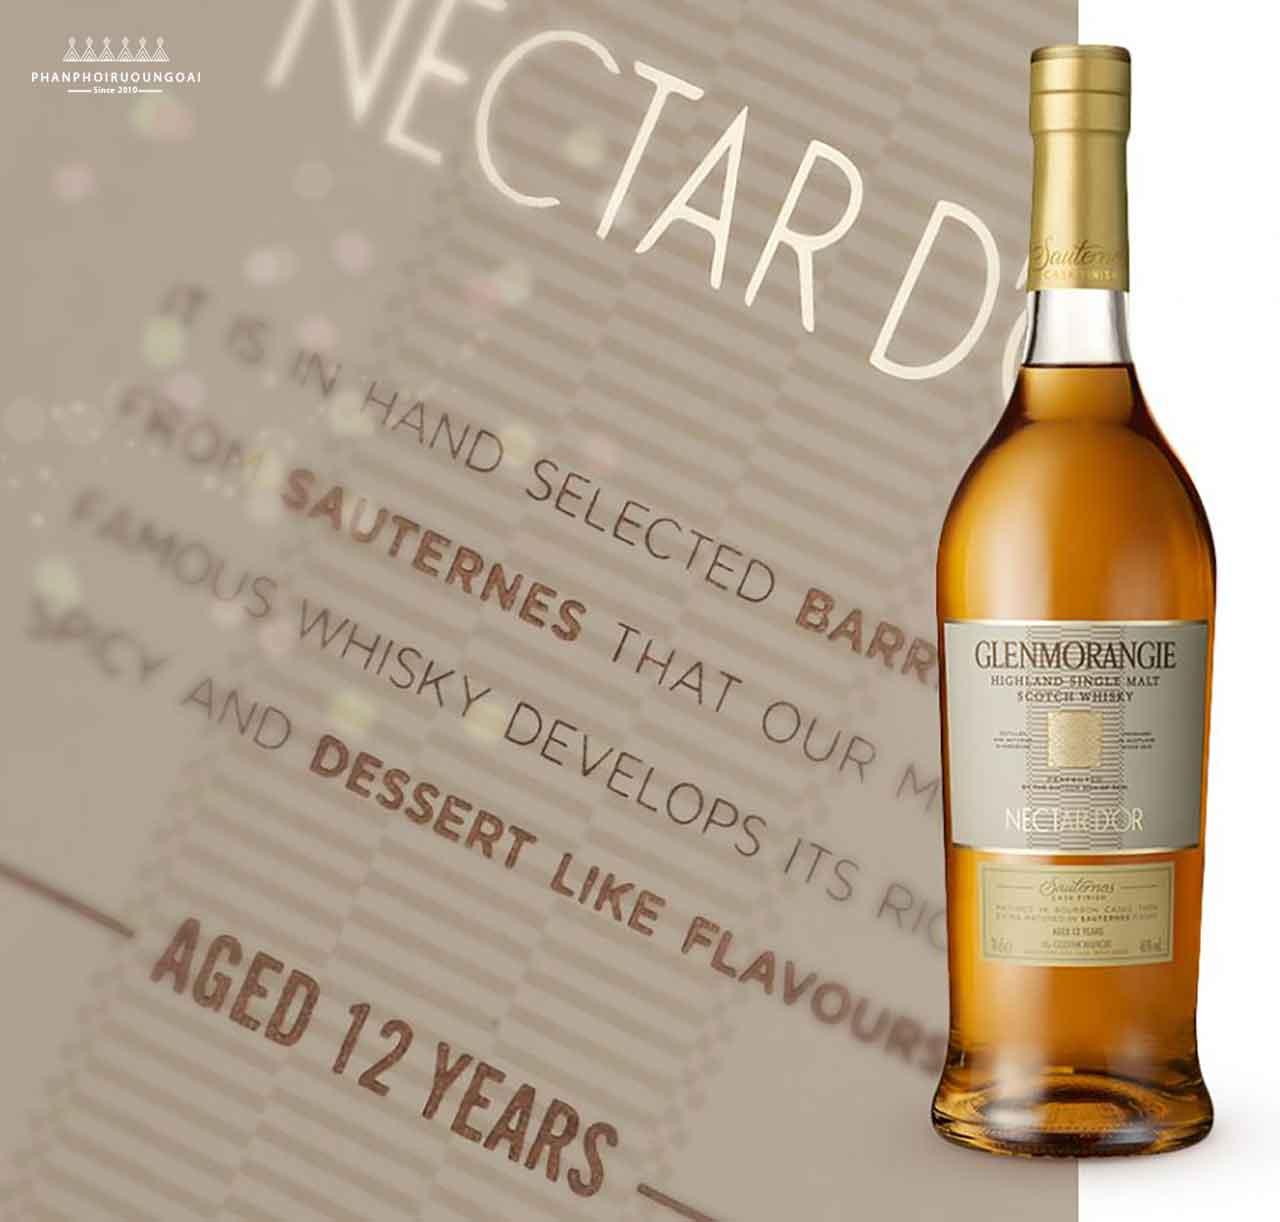 Nhãn chai rượu Glenmorangie Nectar D'Or